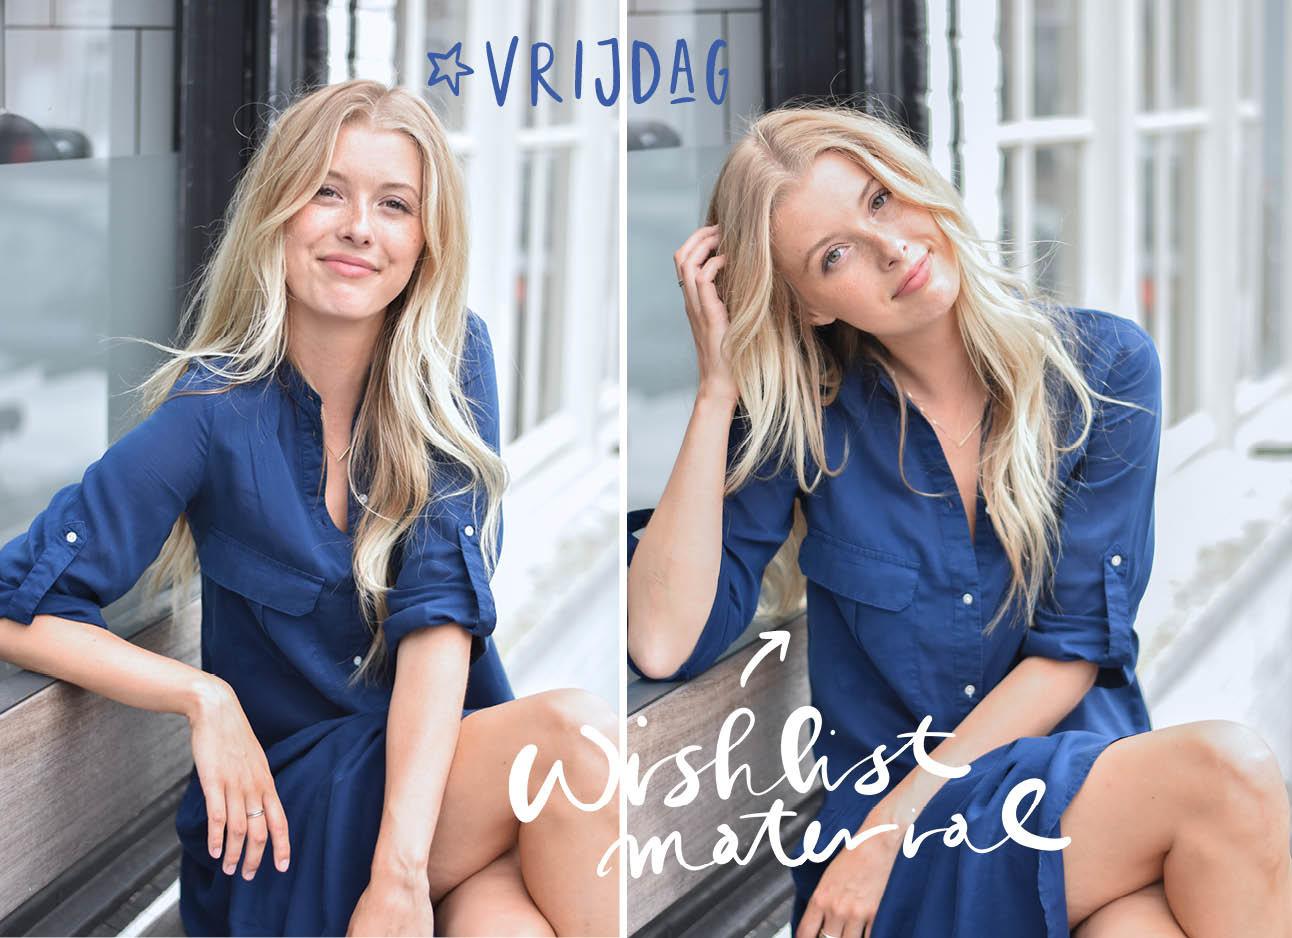 annabelle van hardeveld met blonde krullen in een donkerblauwe jurk